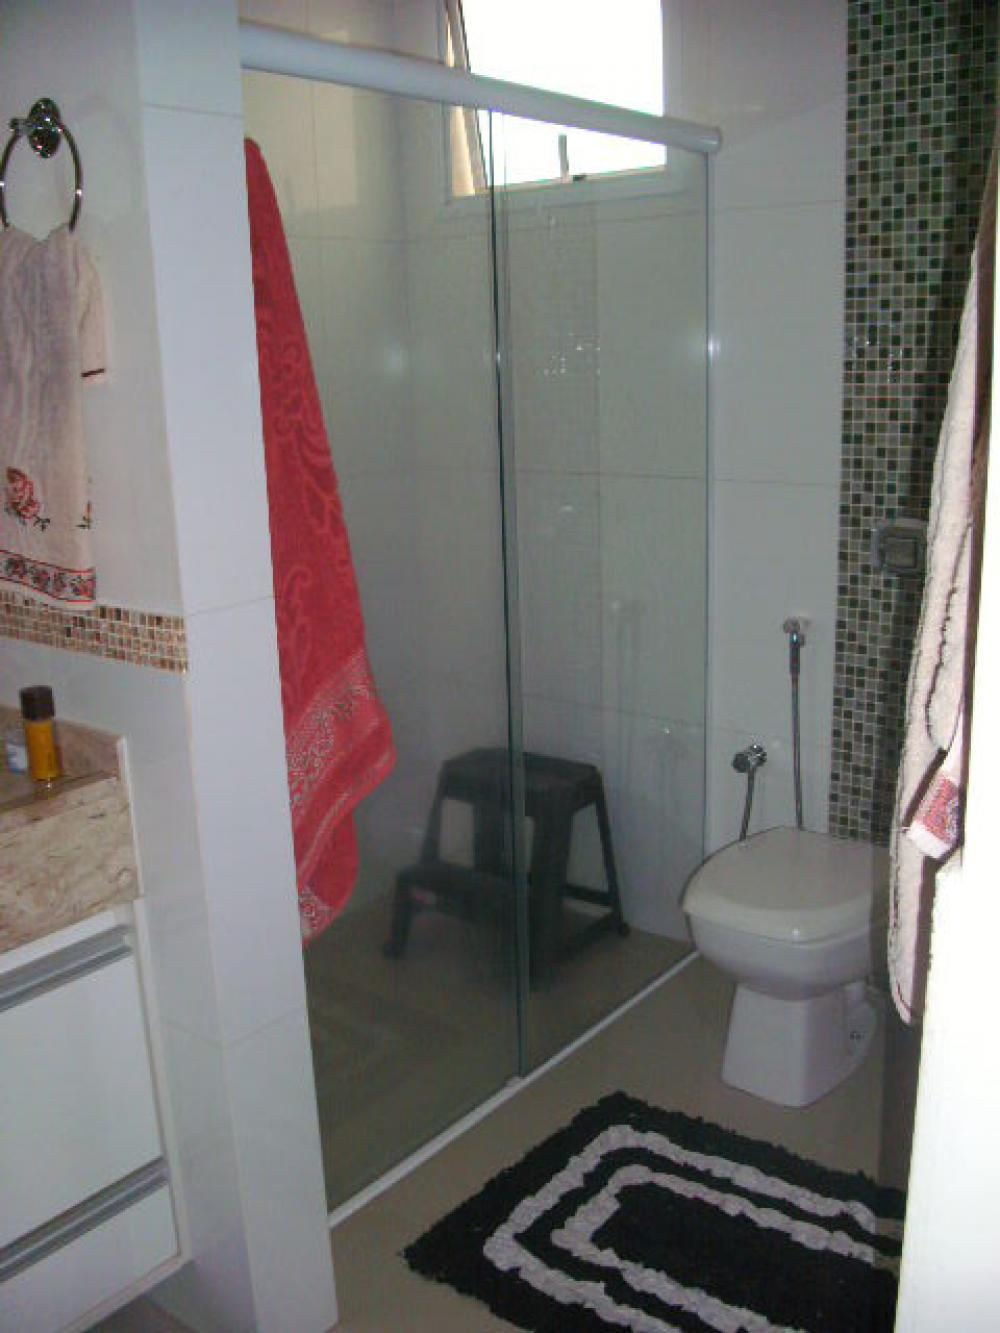 Comprar Casa / Condomínio em Mirassol R$ 750.000,00 - Foto 5